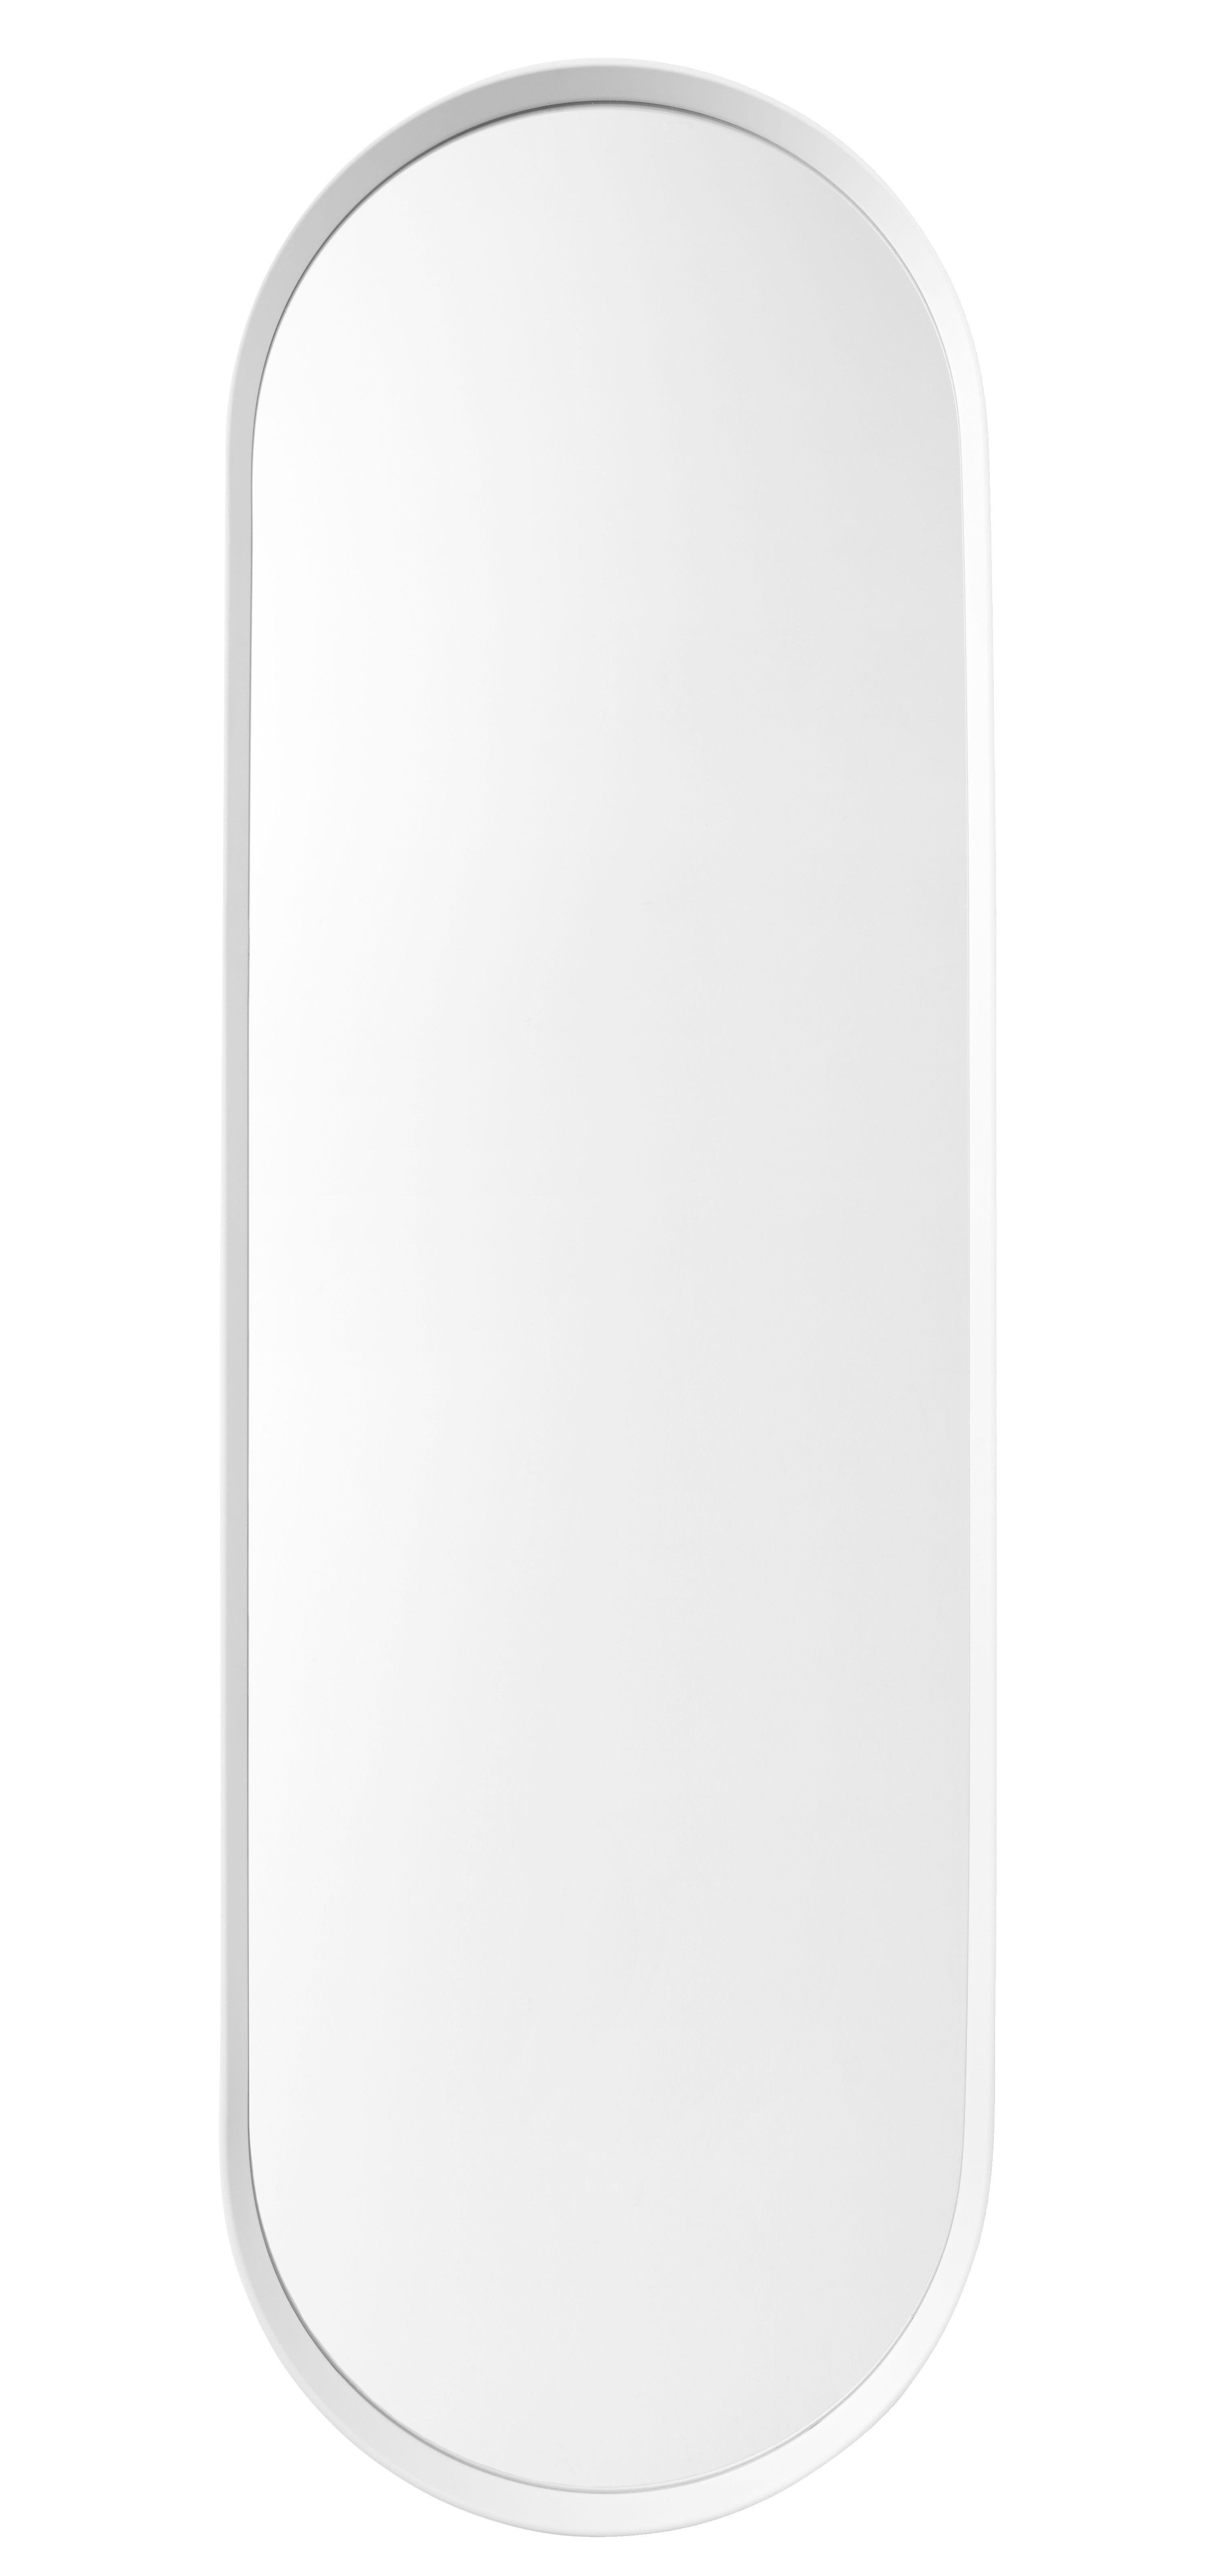 Déco - Miroirs - Miroir mural Norm / H 129 cm - Métal - Menu - Blanc - Aluminium peint, Verre